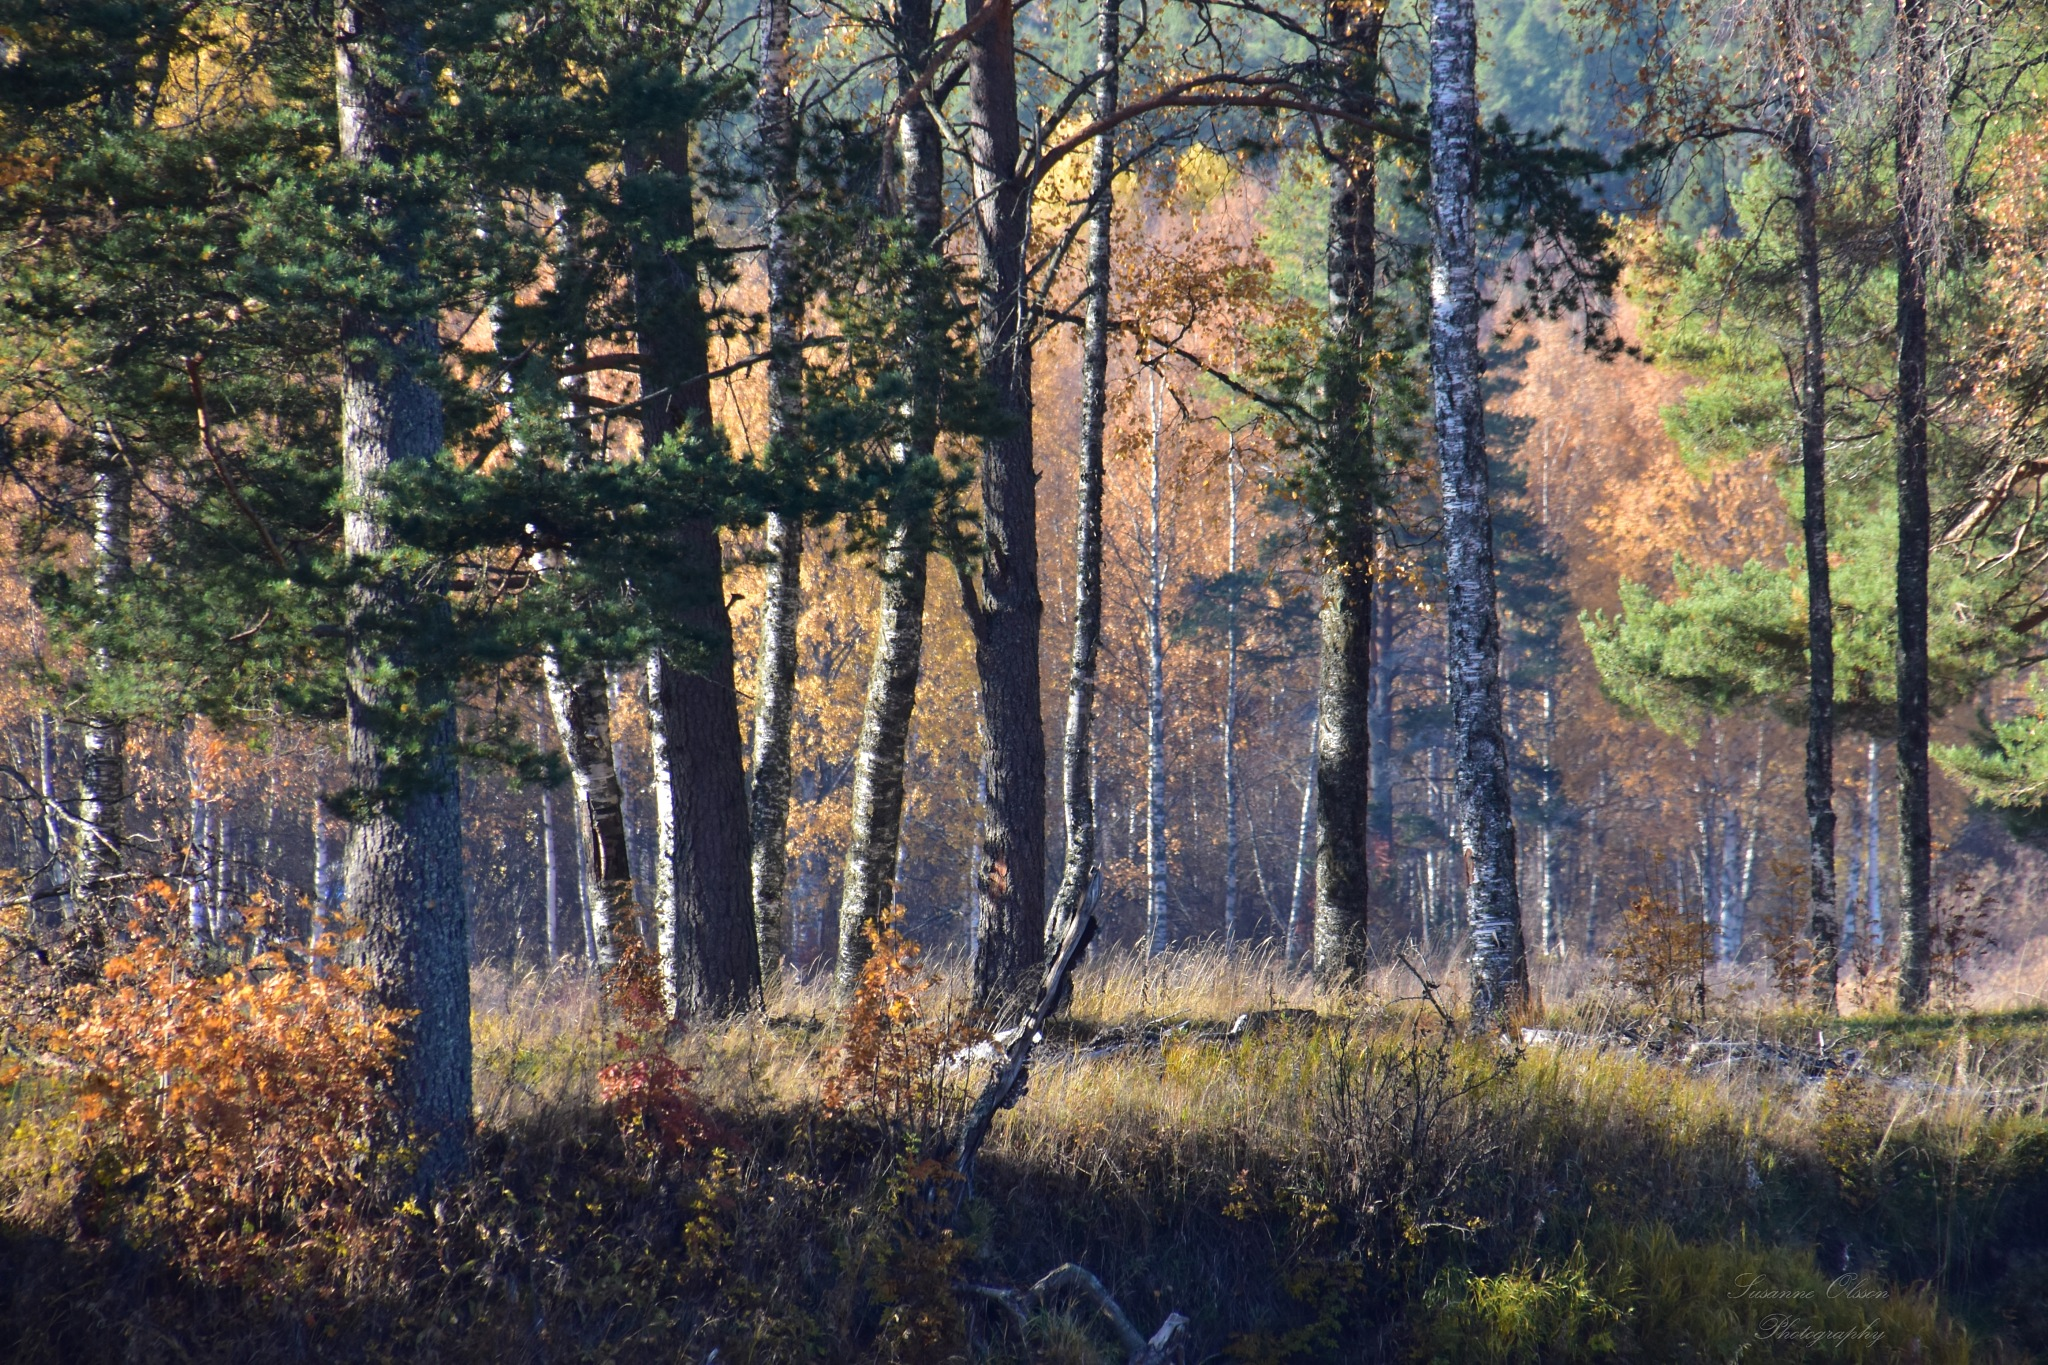 Hösttavla III by Susanne Olsson